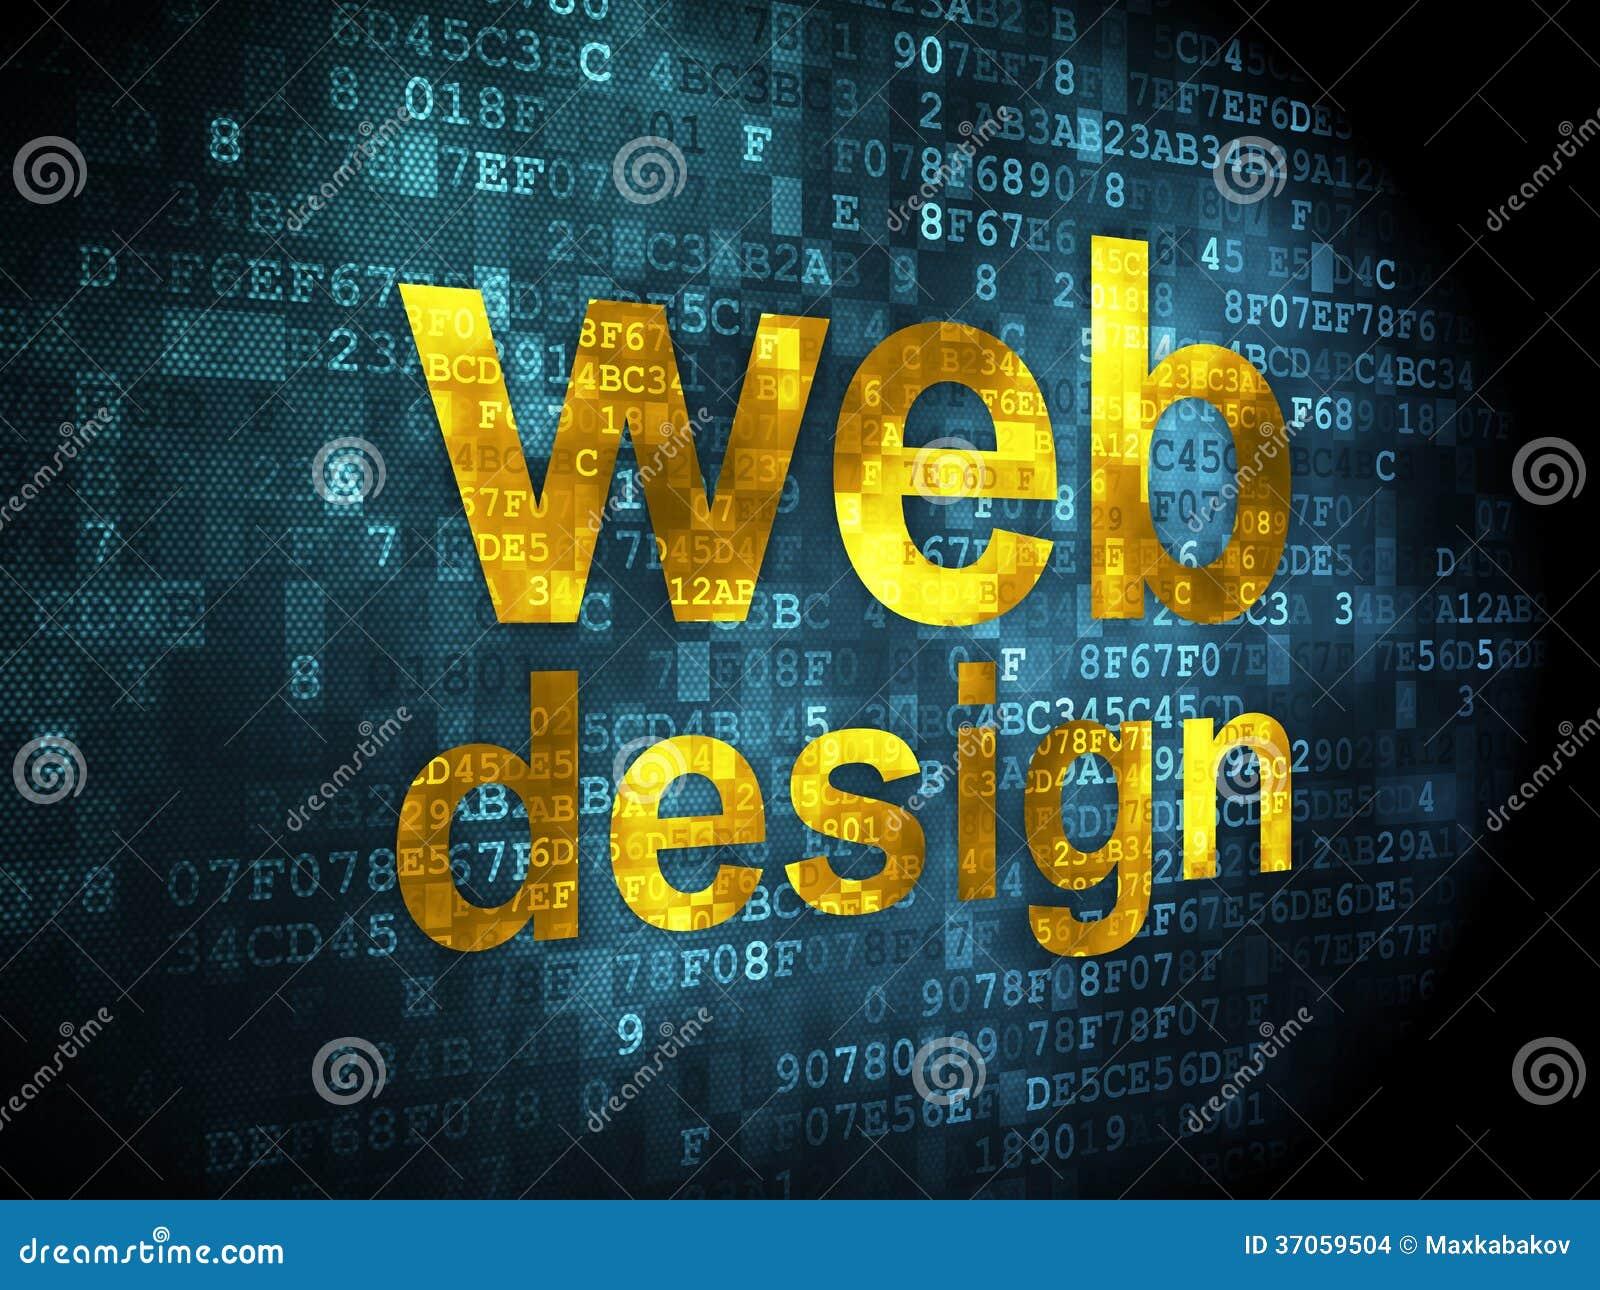 SEO Web Development Concept: Web Design On Digital Stock ...